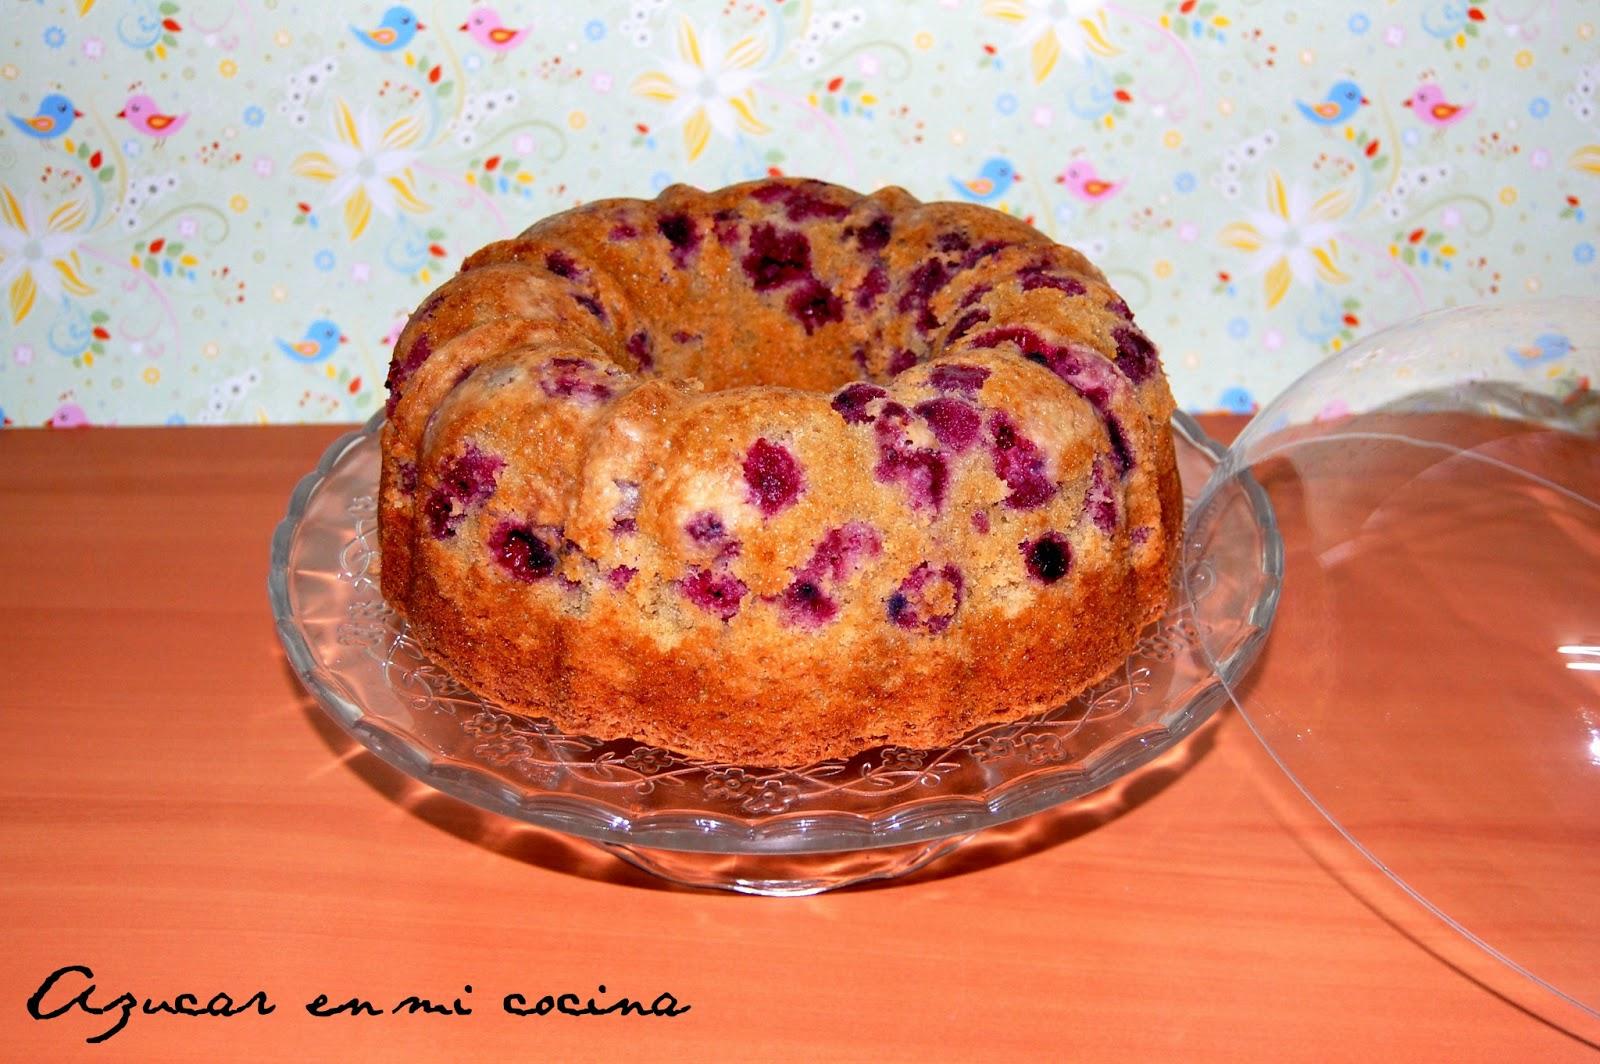 http://azucarenmicocina.blogspot.com.es/2013/06/bundt-cakes-de-frambuesas-y-chocolate_7.html